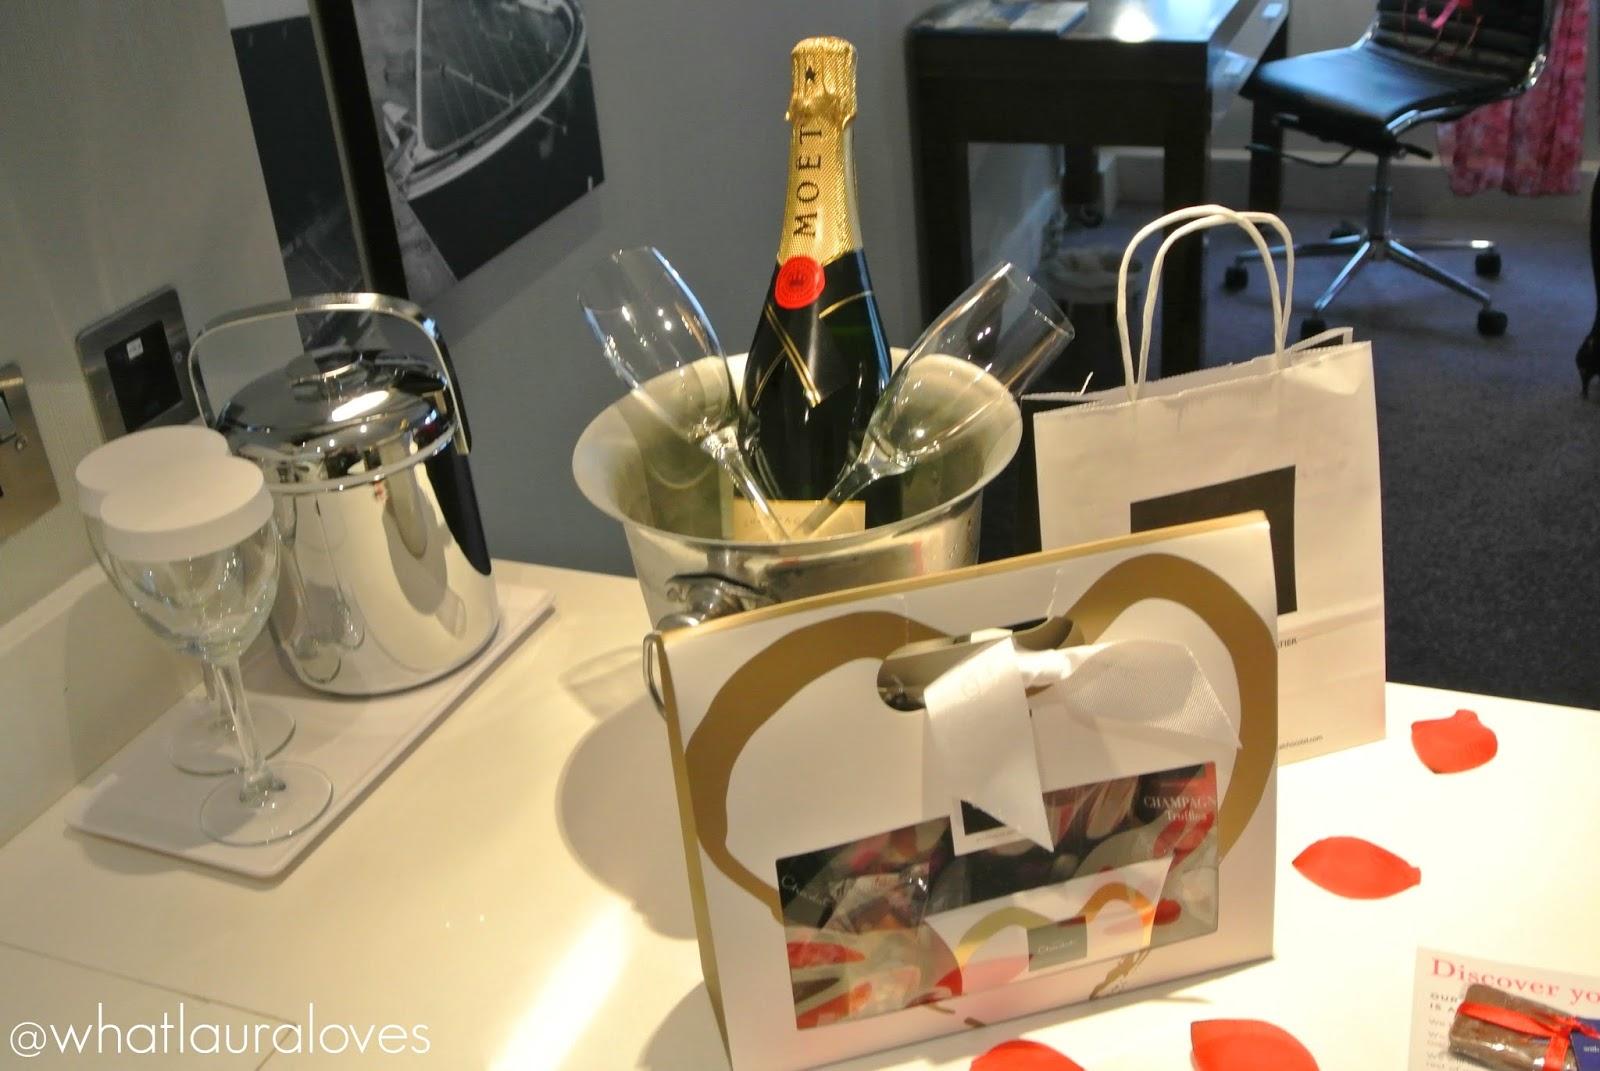 Sandman Signature Hotel Newcastle Valentines Day Package